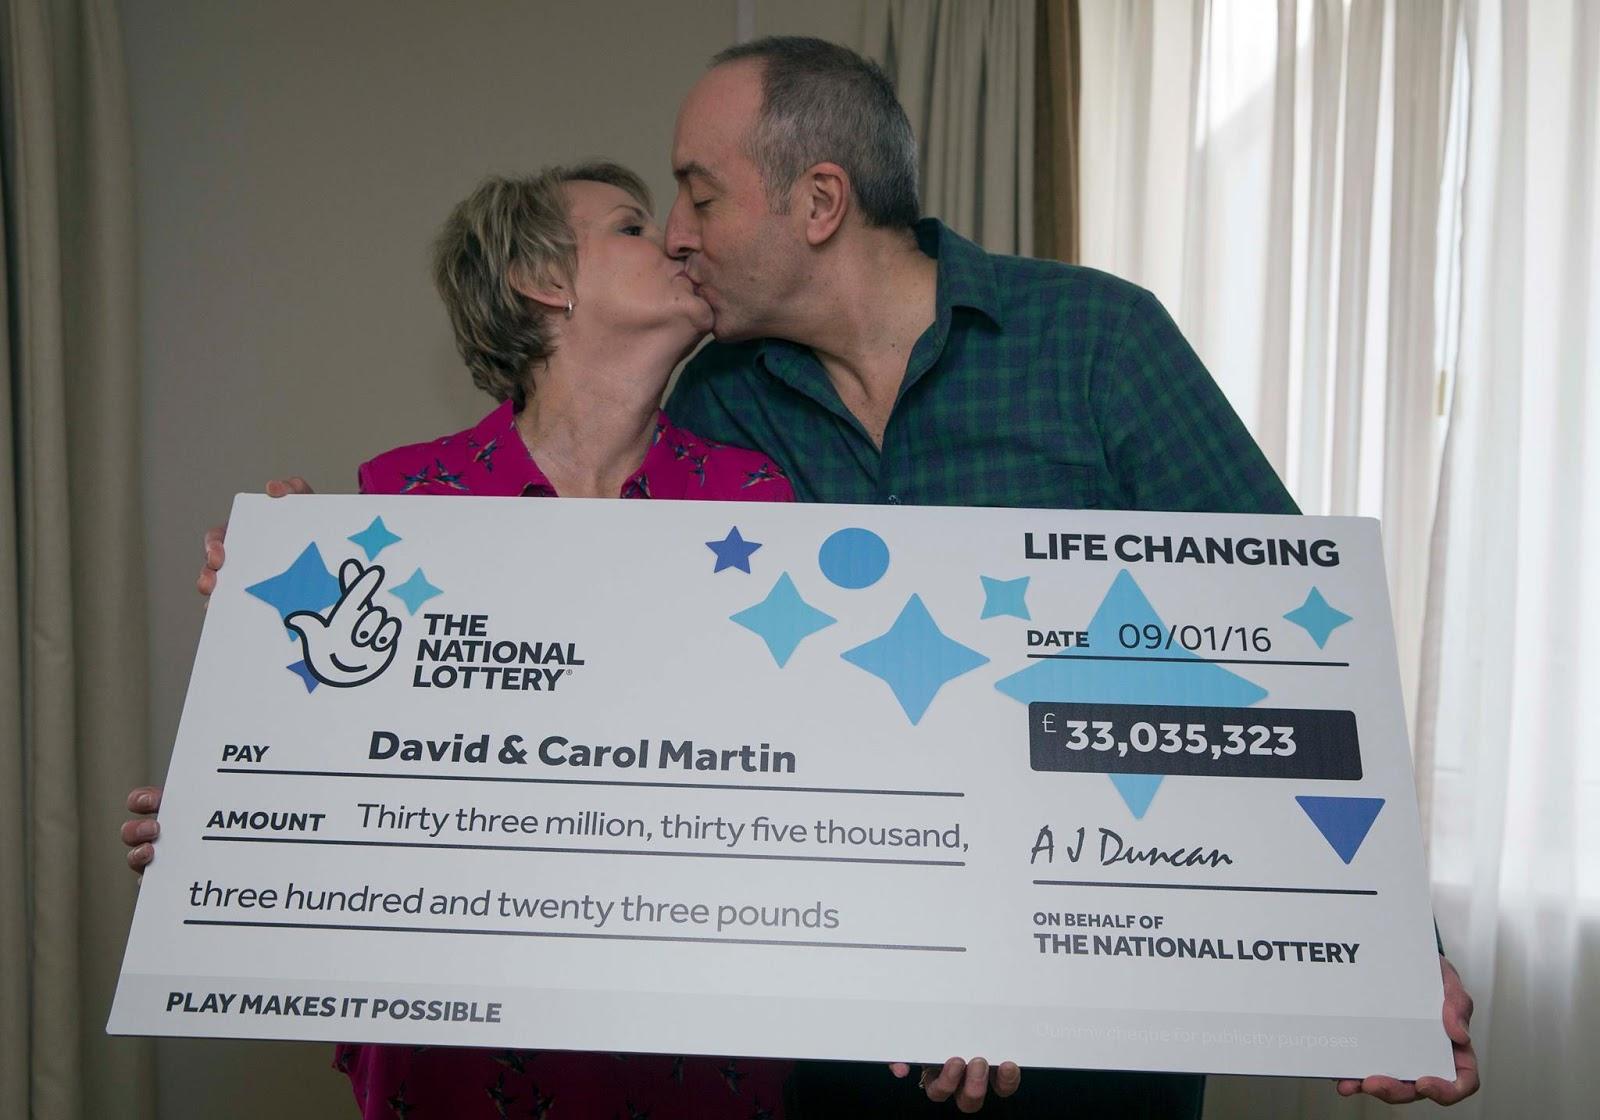 David & Carol Martin from Scotland won £33 million on Lotto